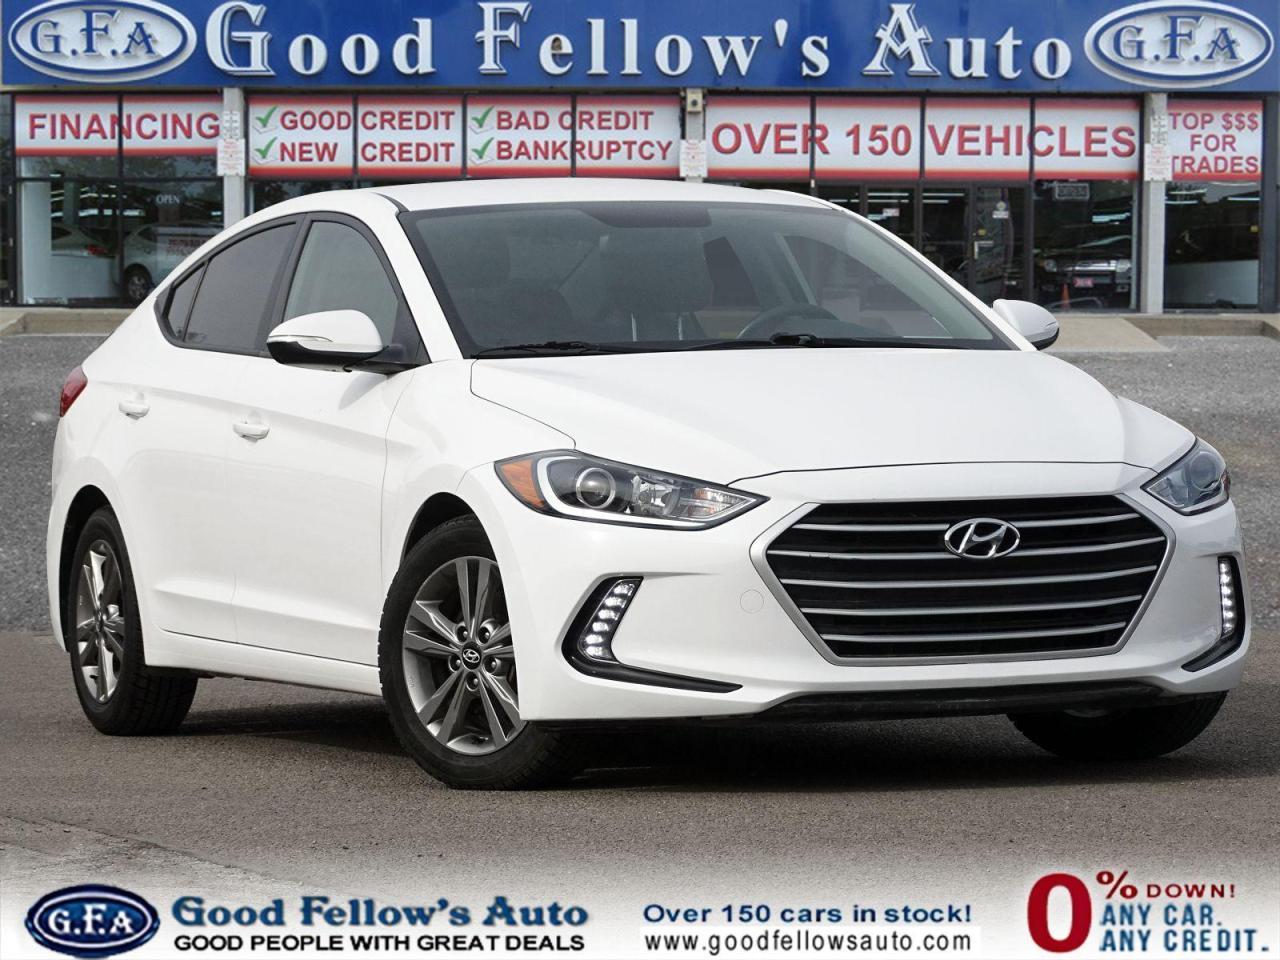 used 2017 Hyundai Elantra car, priced at $14,900